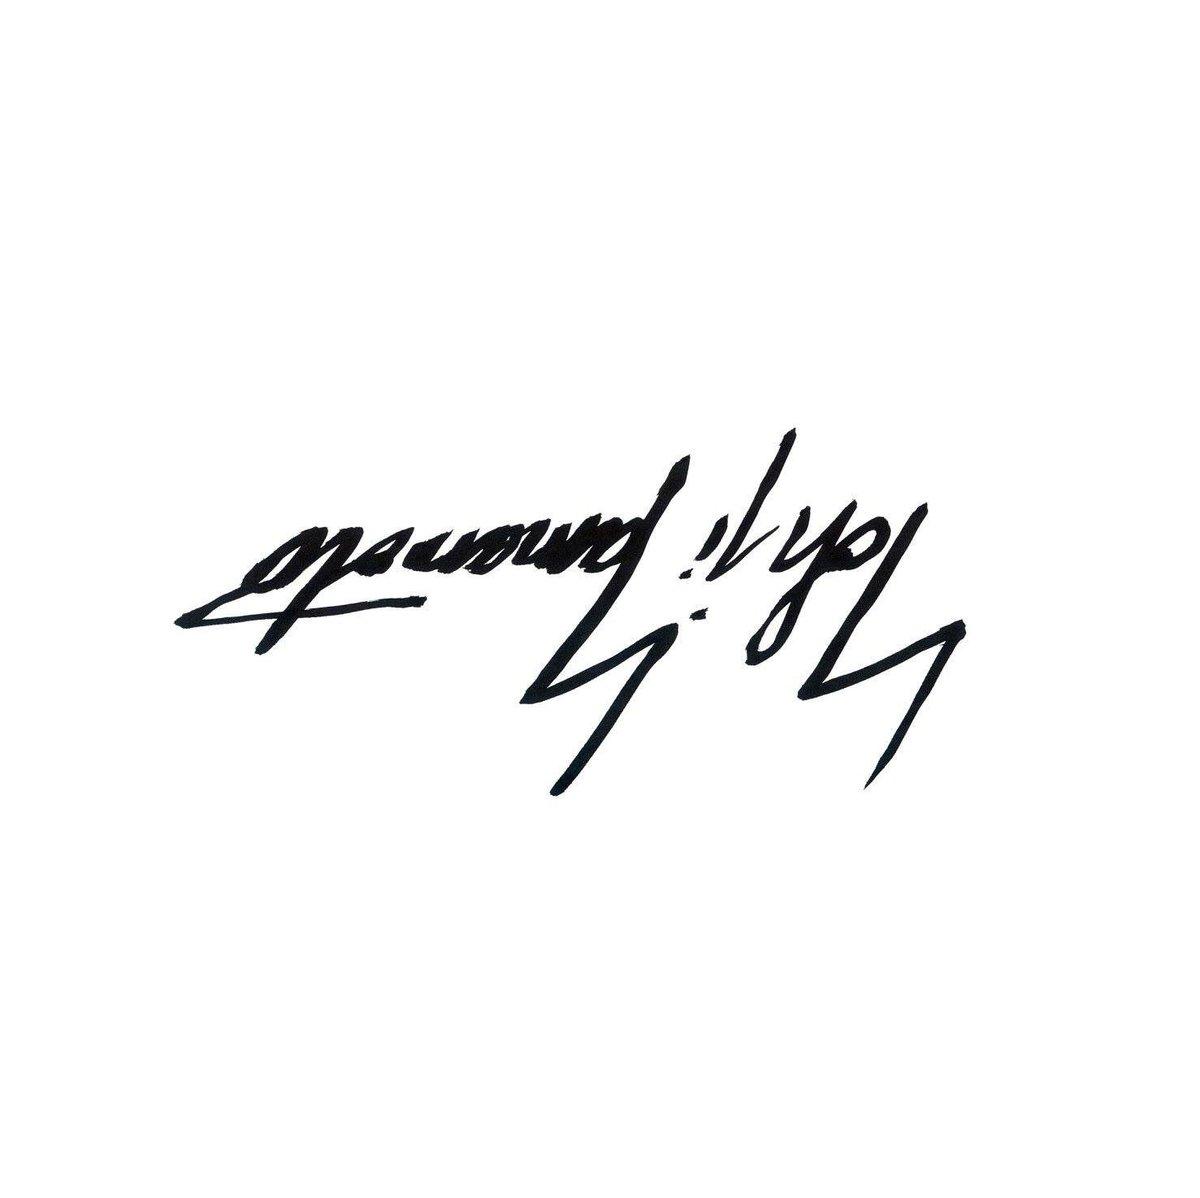 "Ground Y Official on Twitter: ""Ground Y Menbers https://t.co/idC1nvFdj3 . #groundy #laforet #limifeu #fashion #art #yohjiyamamoto #y3 #ginzasix ..."